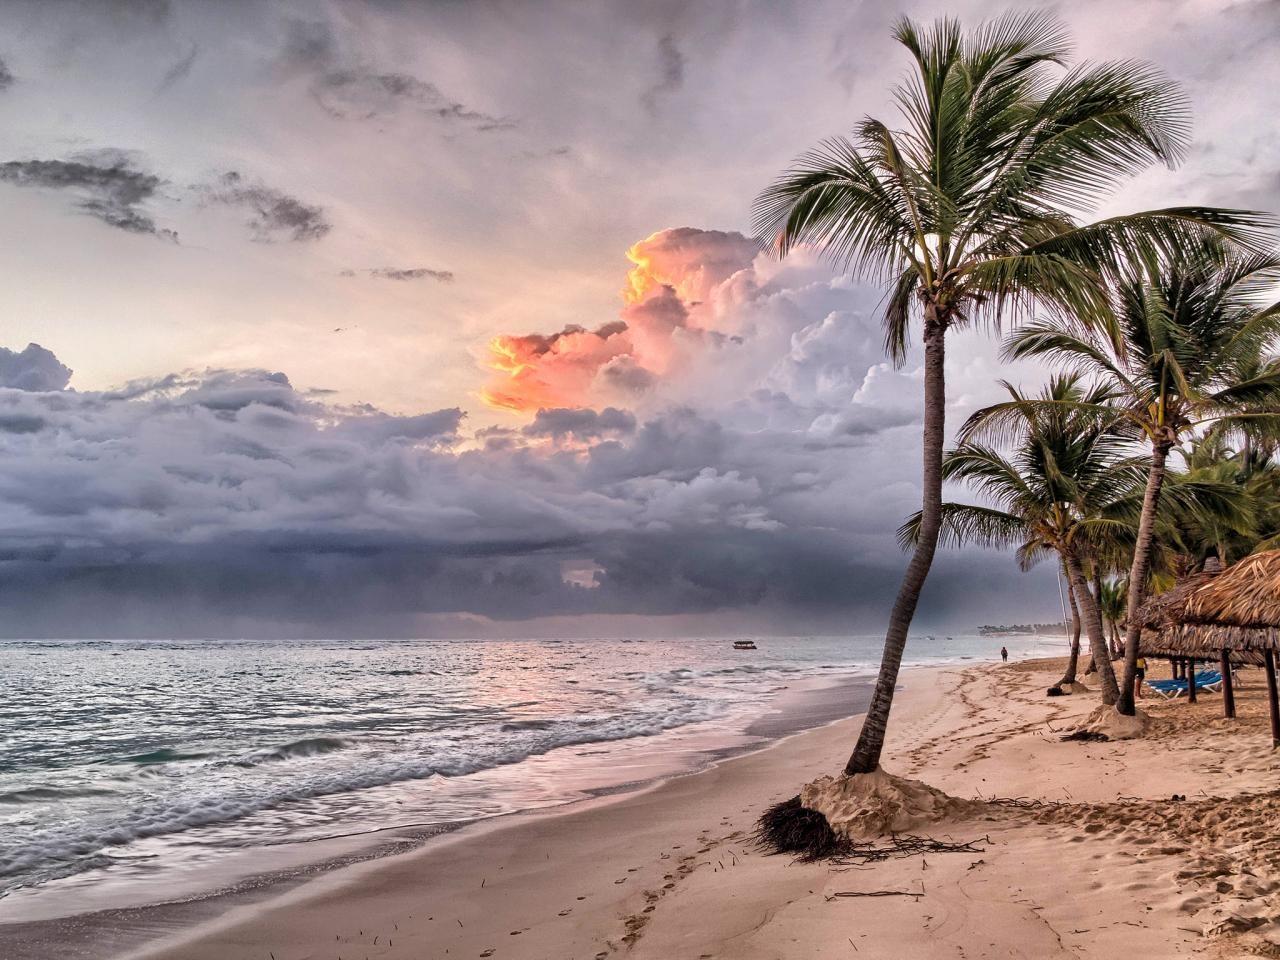 Nude caribbean beach resort